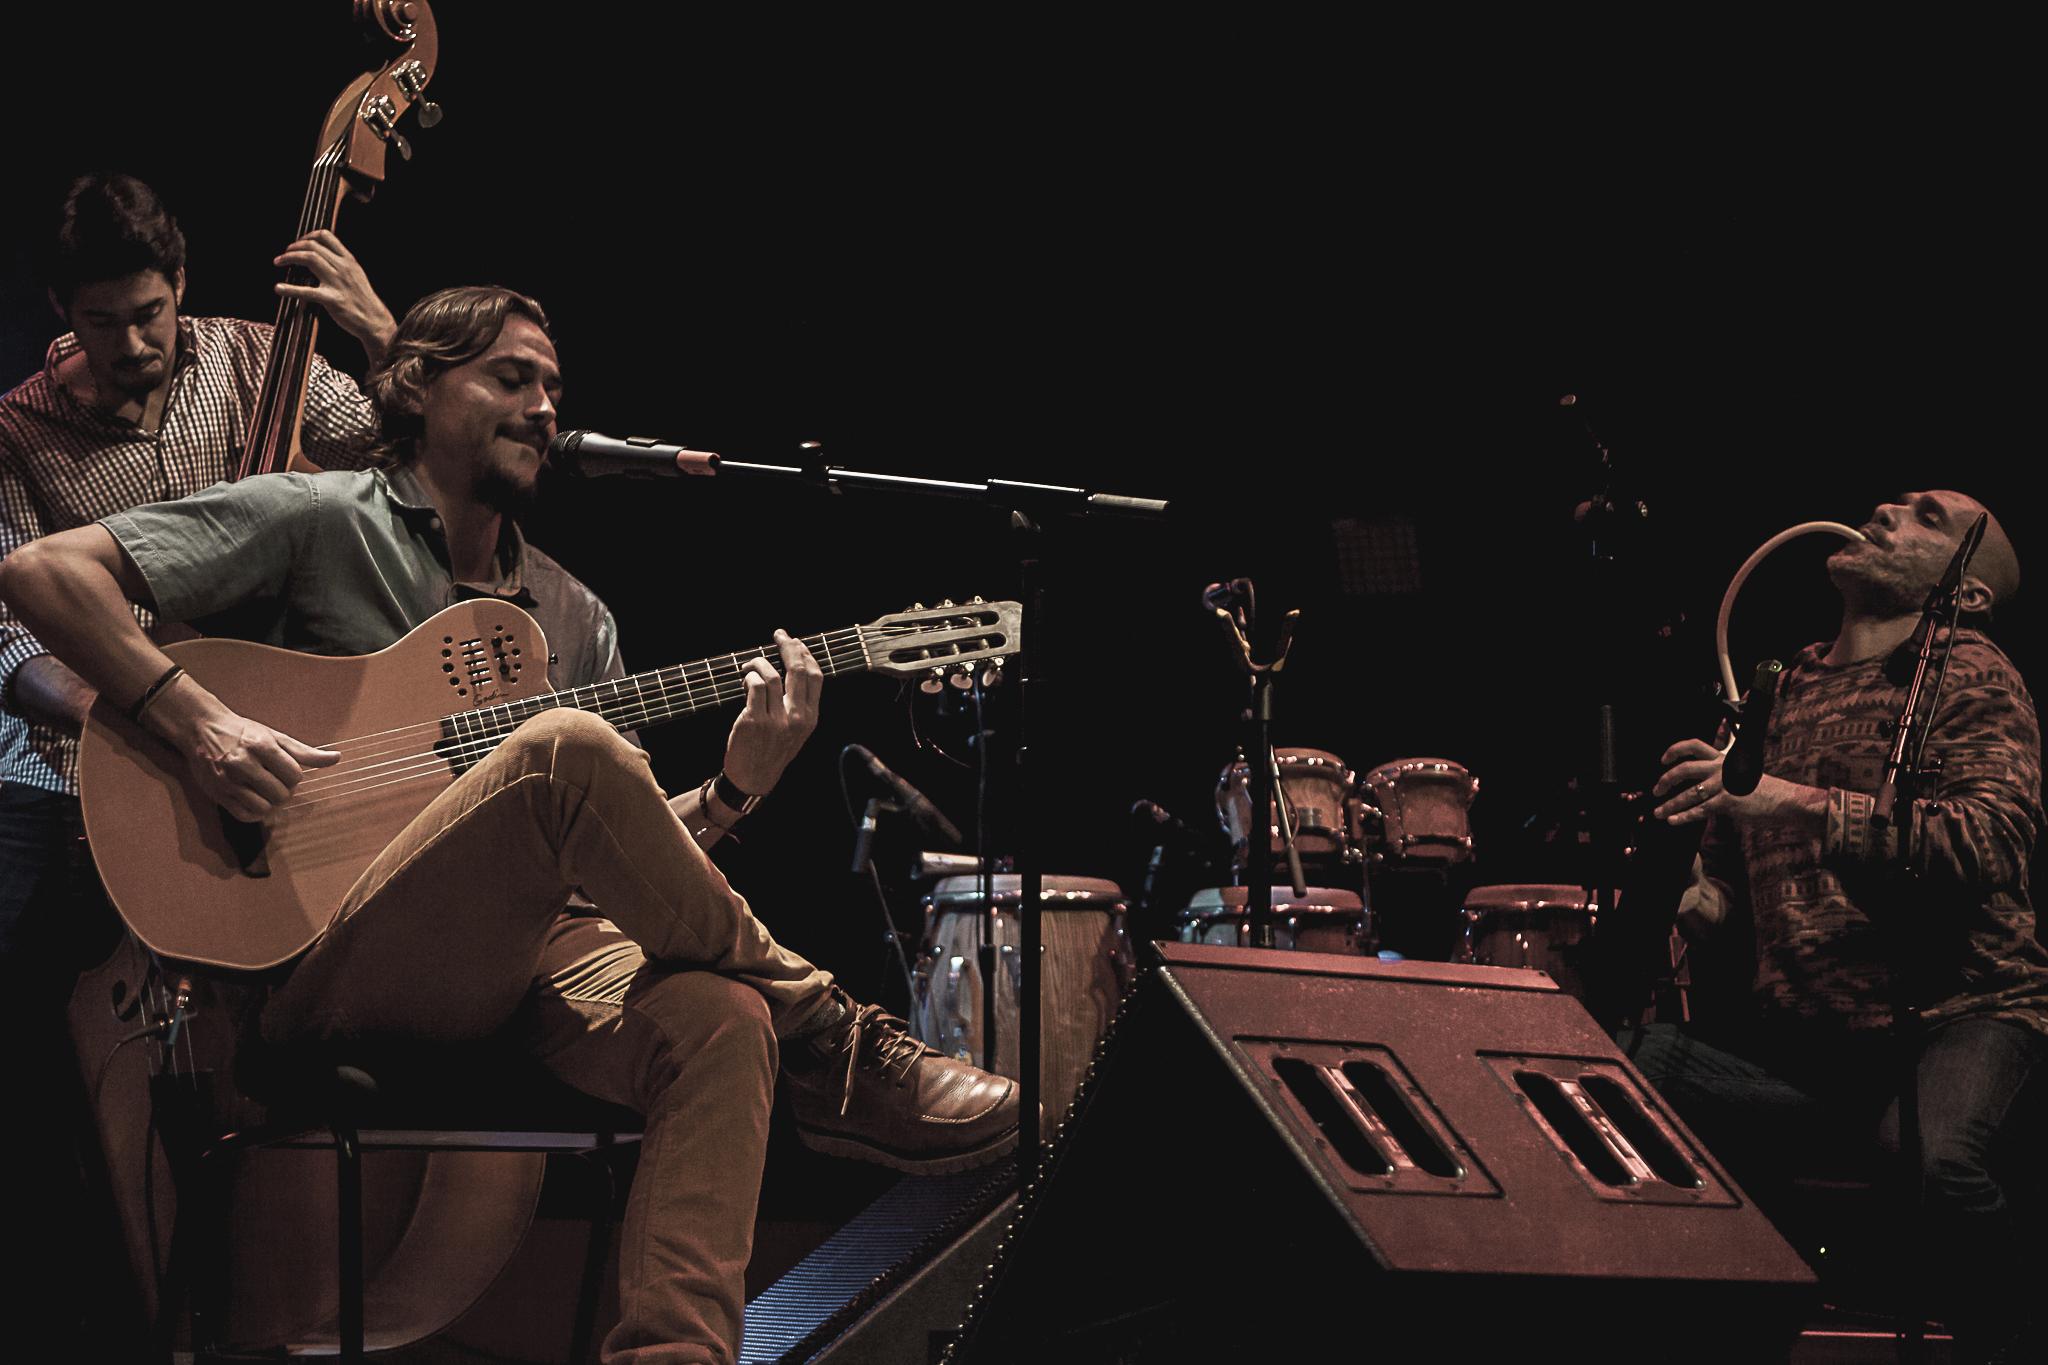 Edu Mundo Sala Suggia Casa da Musica Photography Fotografia On Stage Concert bonjourmolotov Andre Gigante 15